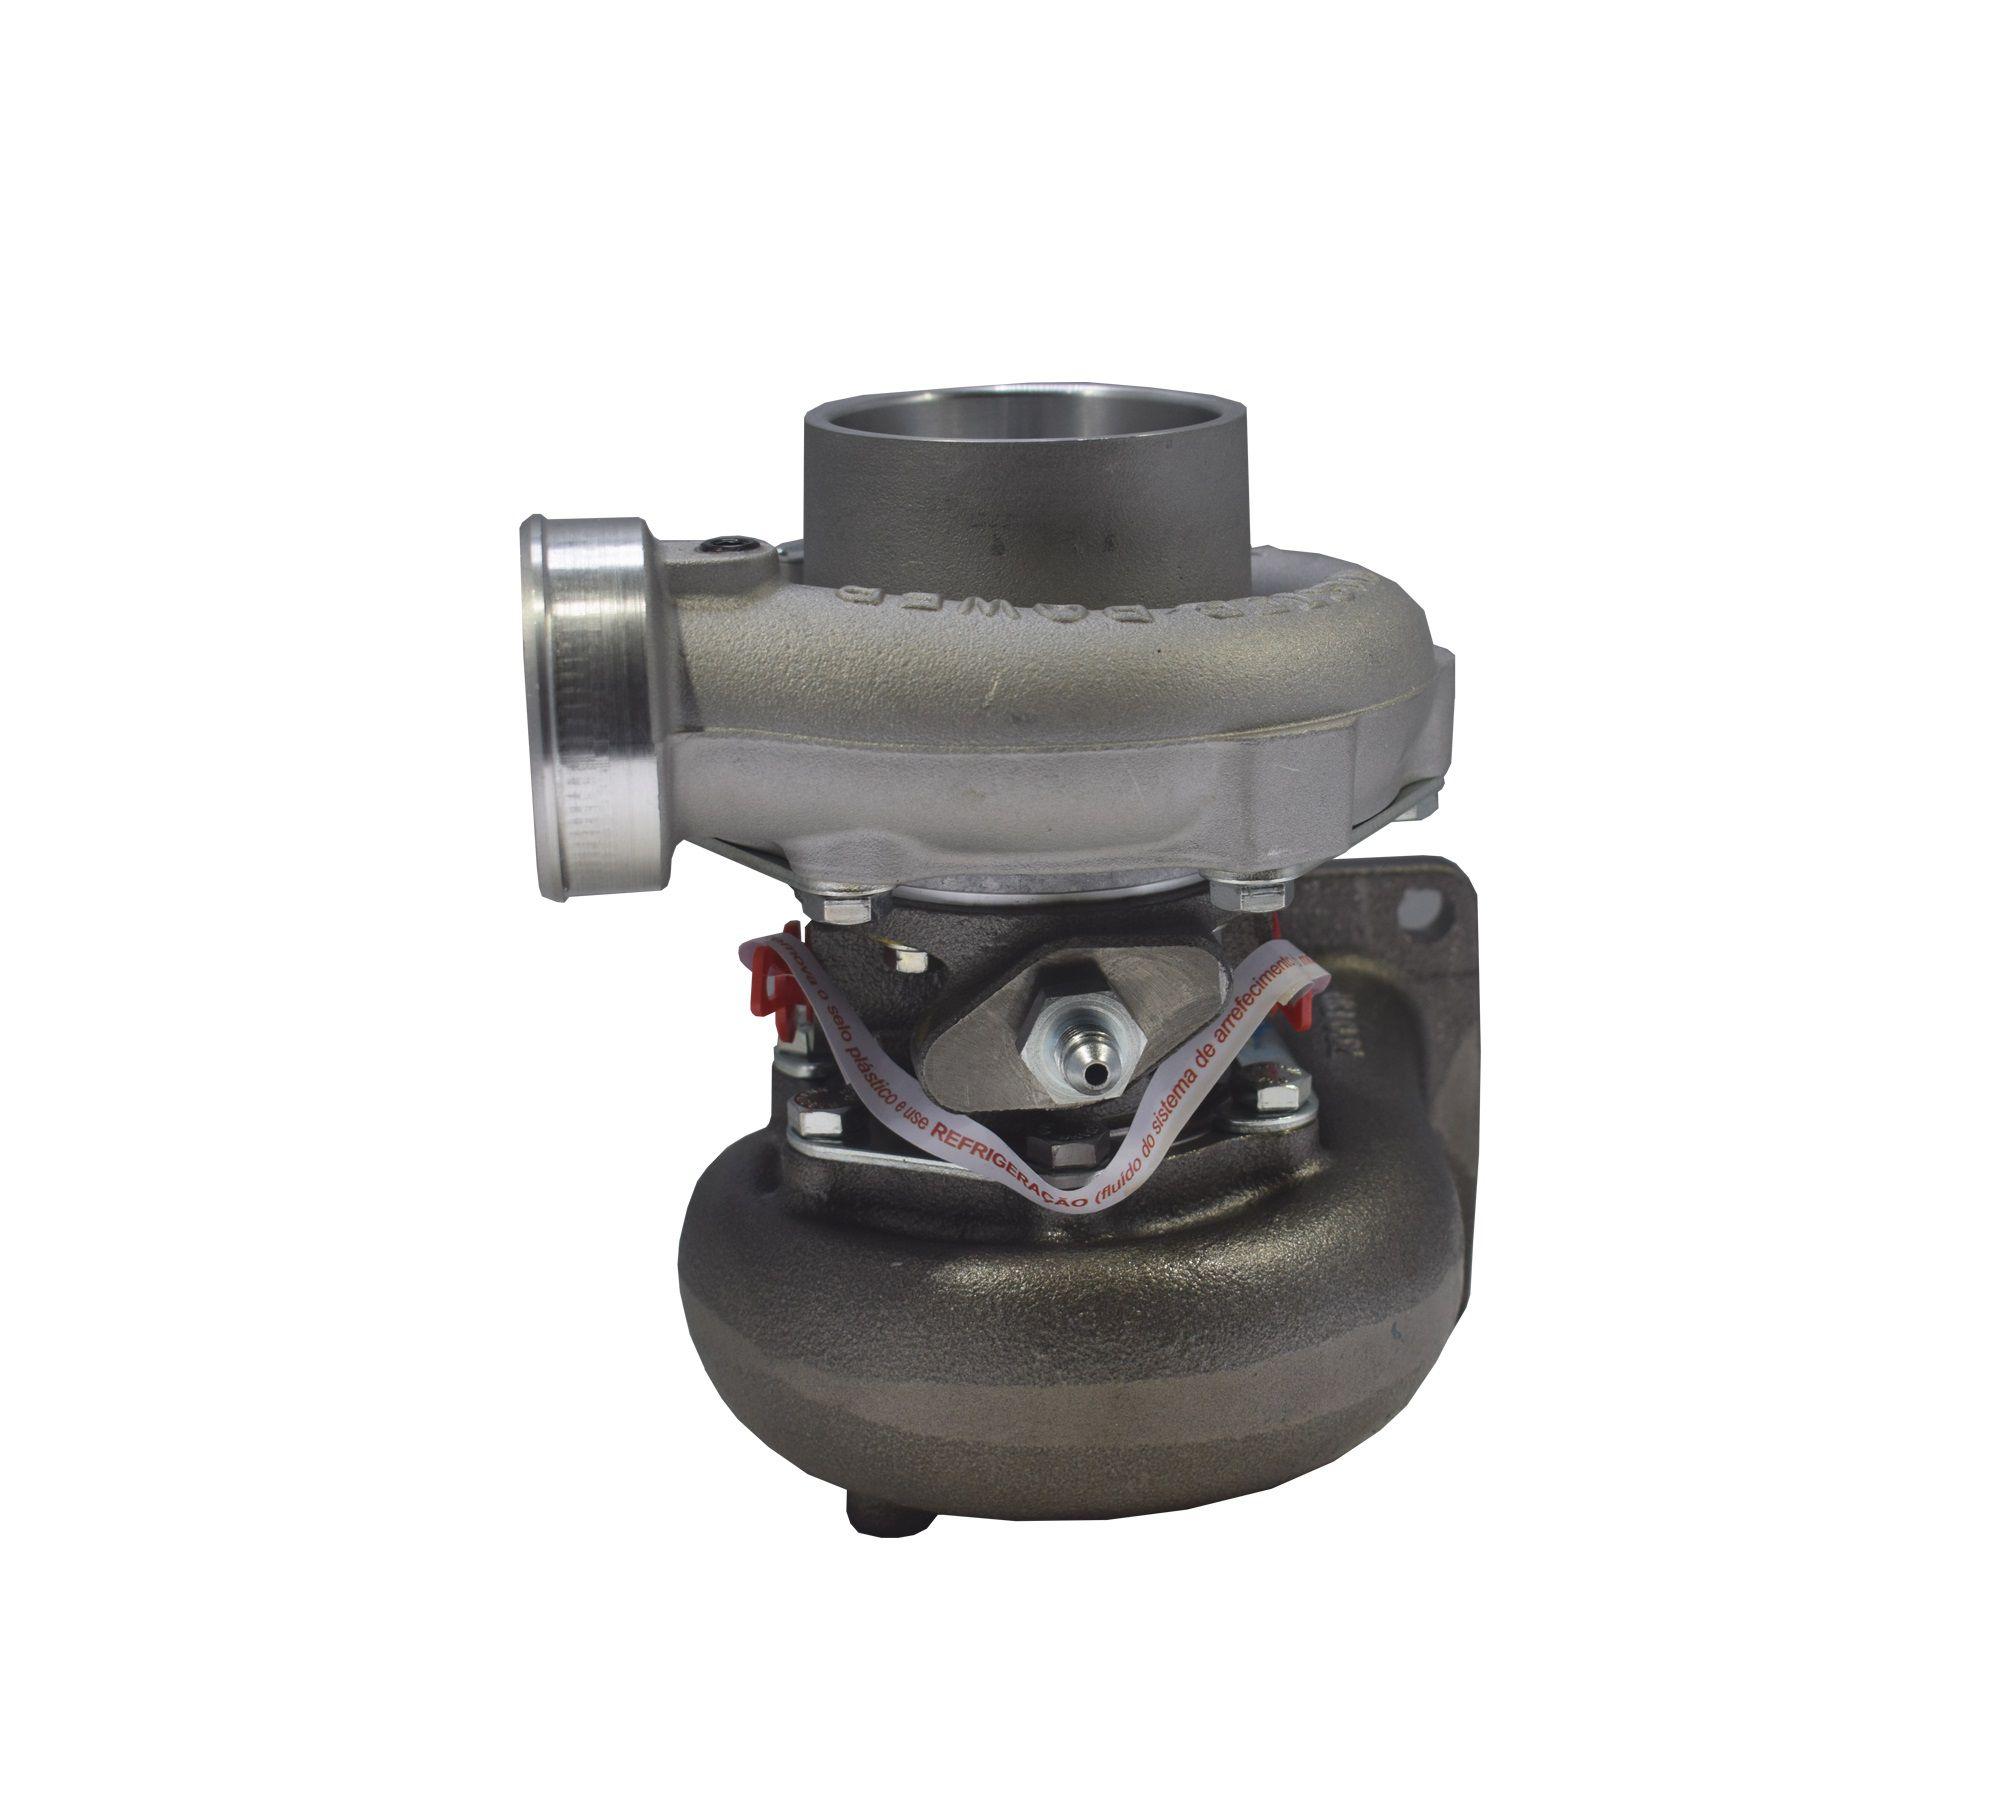 Turbina Roletada / BallBearing Master Power - RB 494 63. Mono